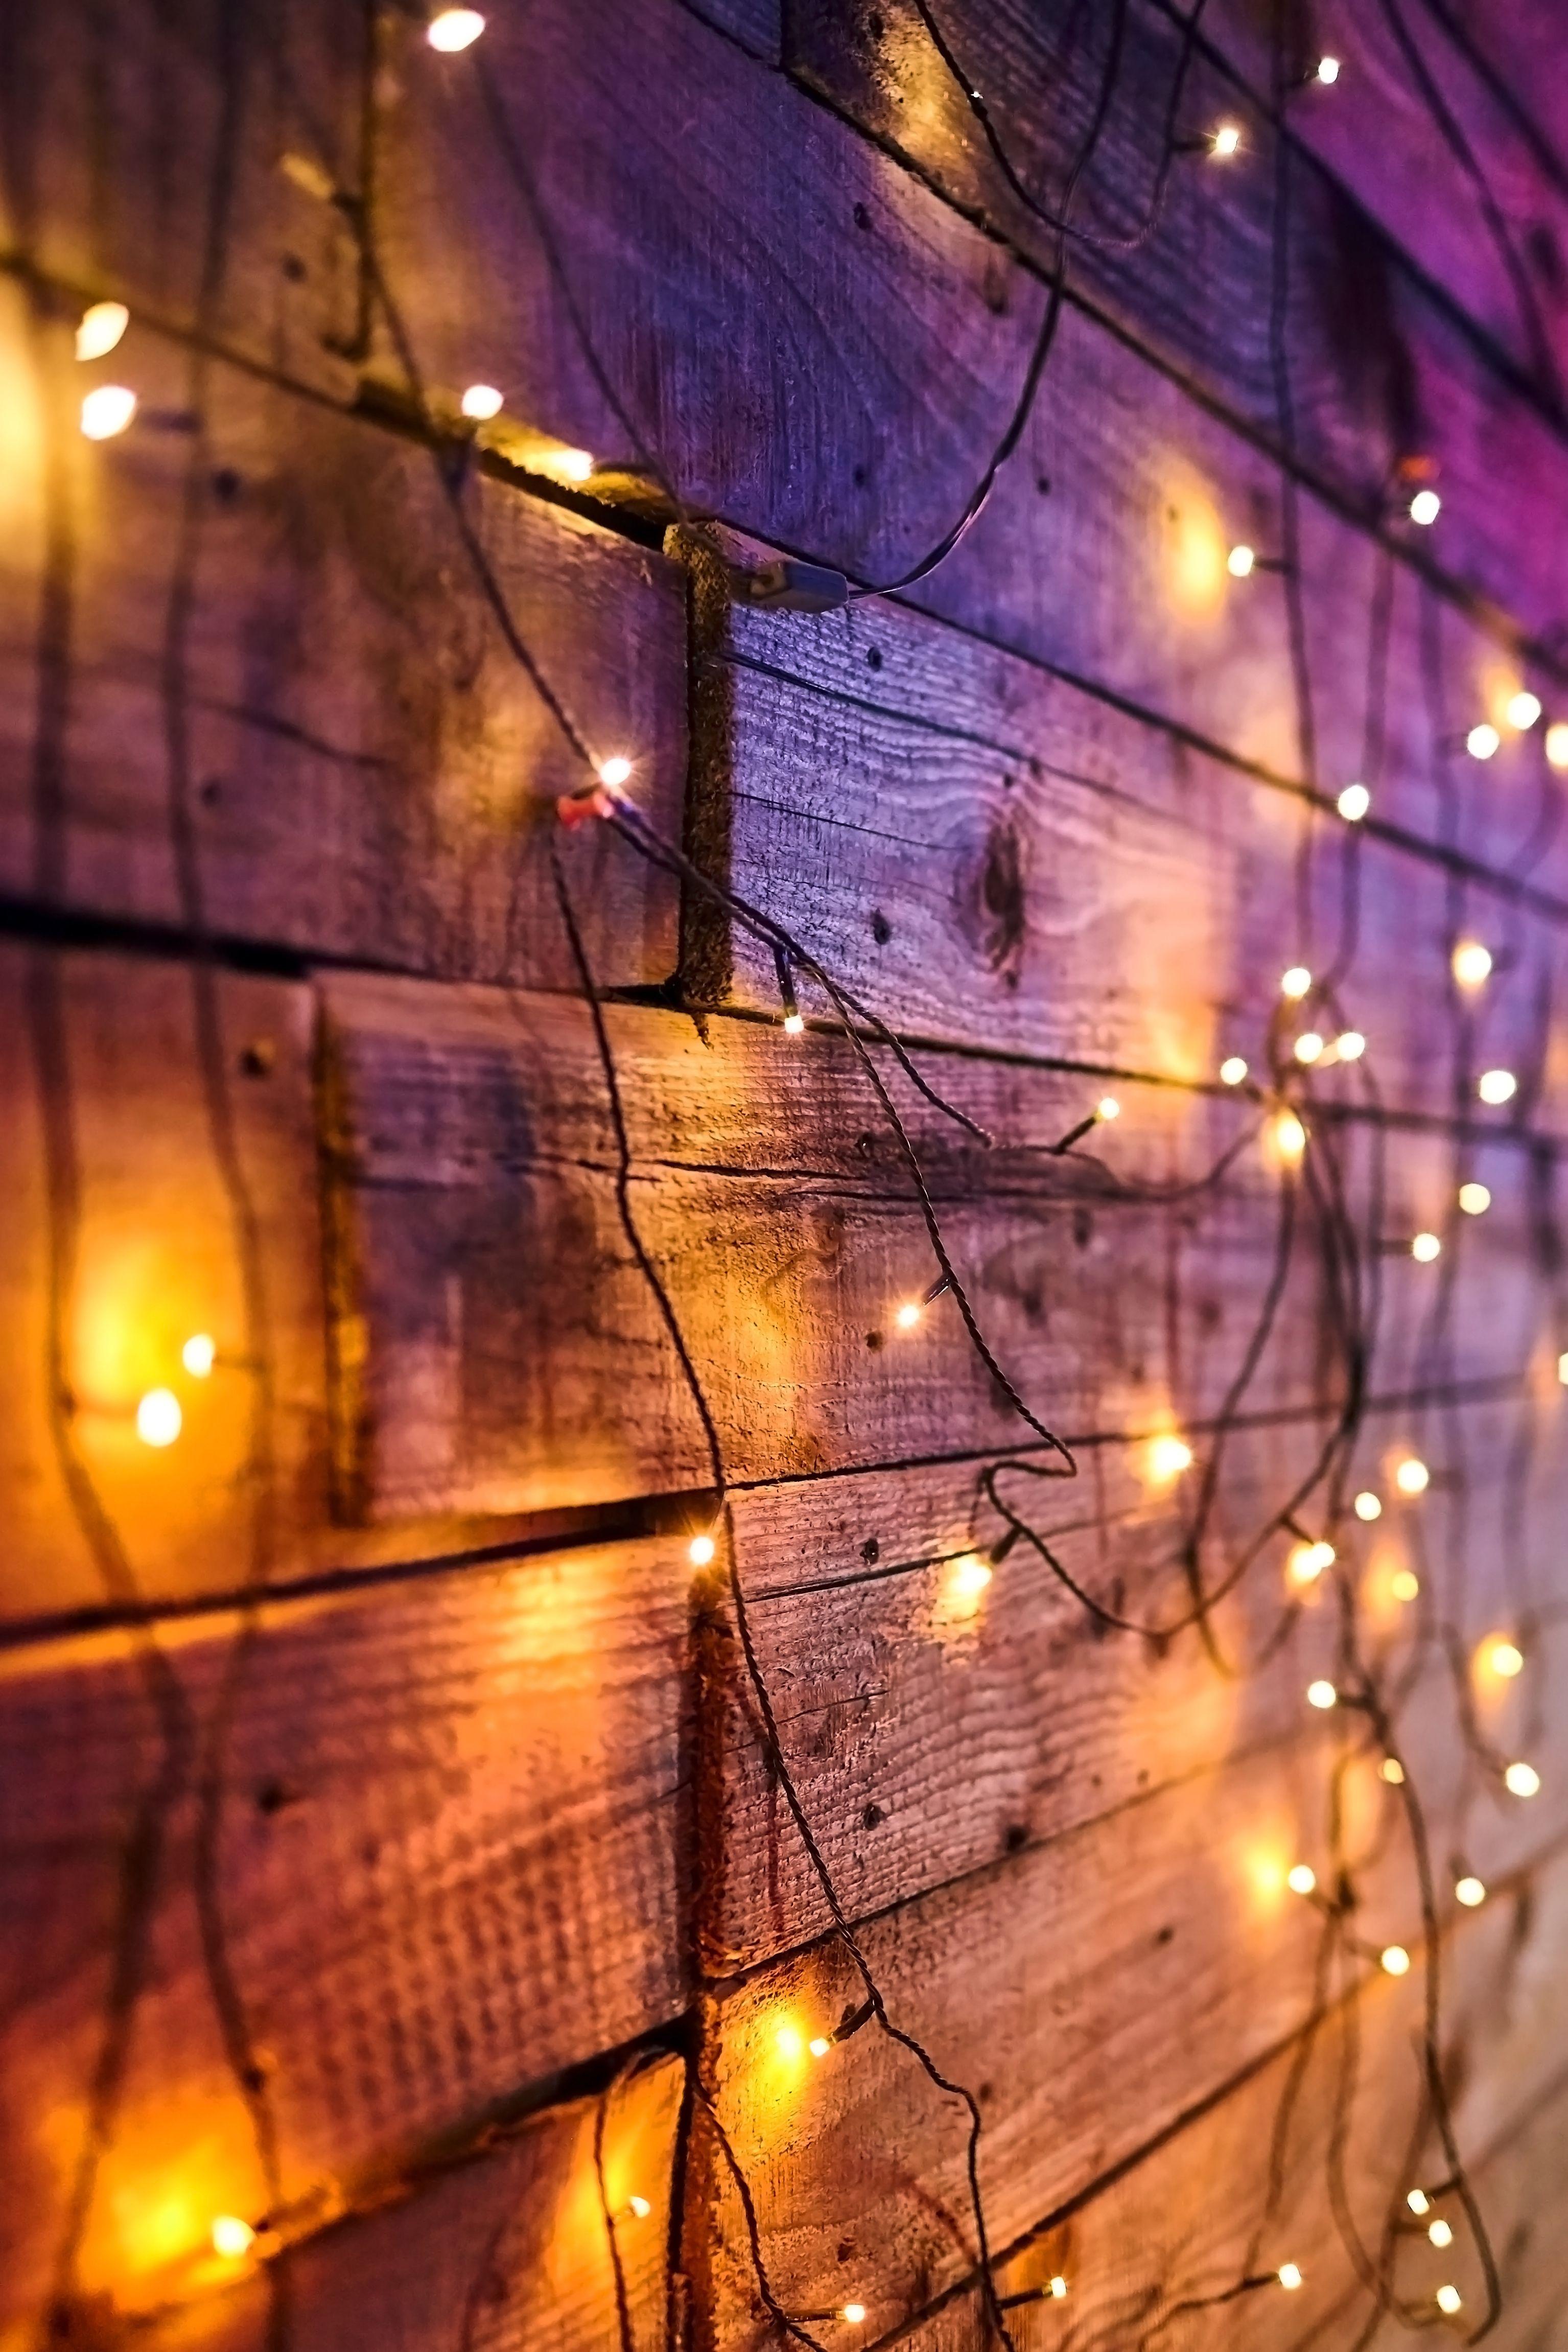 Fairy Lights Iphone Wallpaper Lights Christmas Lights Wallpaper Beautiful Wallpapers Backgrounds